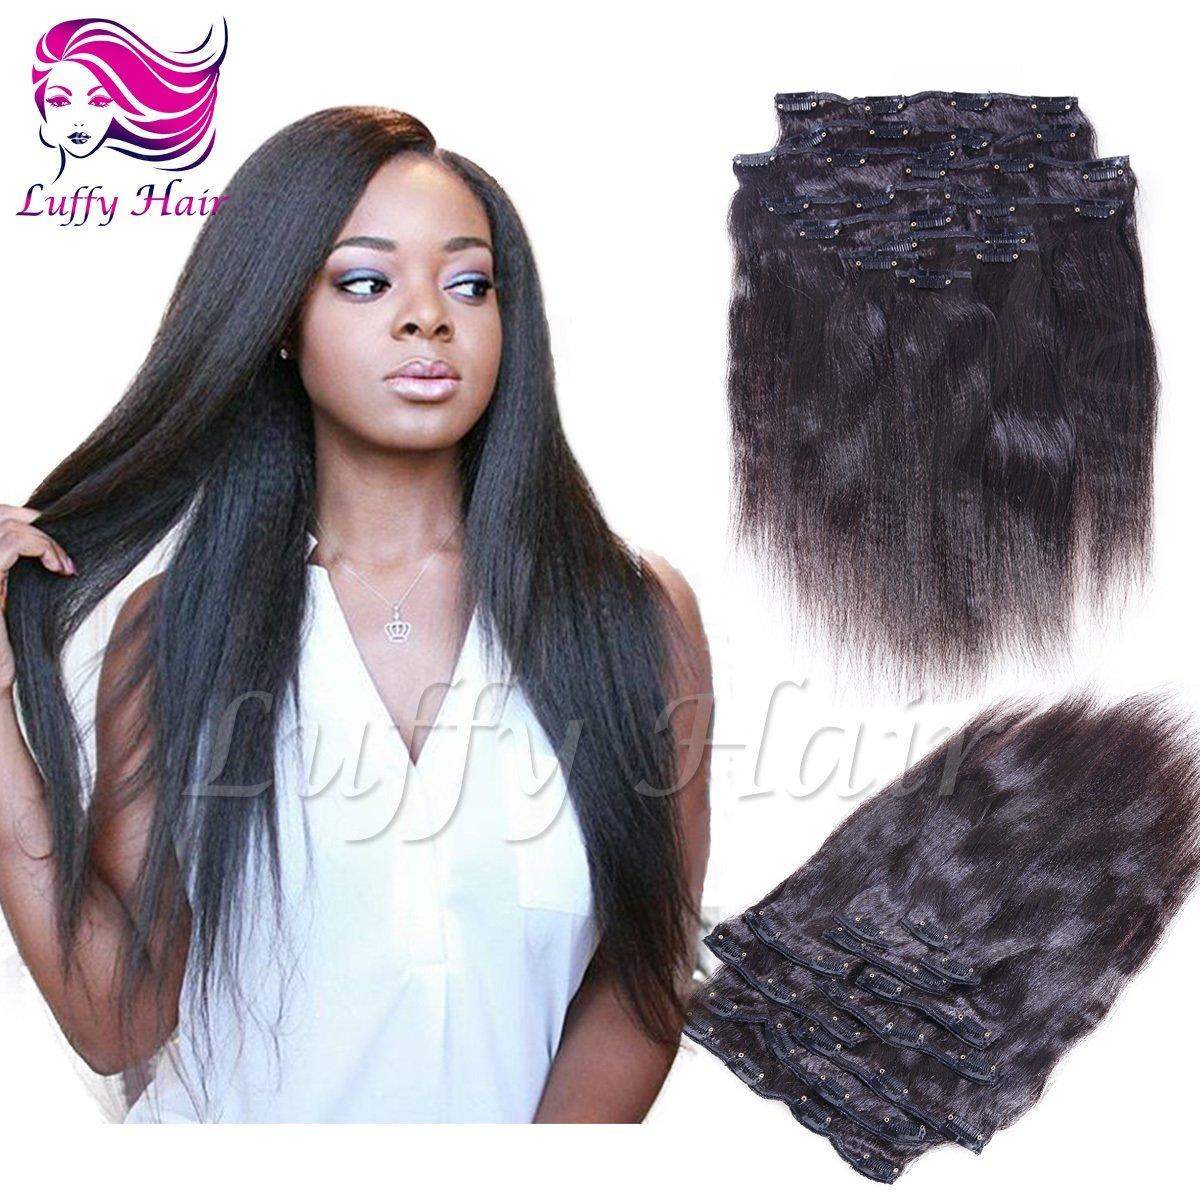 8A Virgin Human Hair Italian Light Yaki Straight Clip In Hair Extensions - KIL002